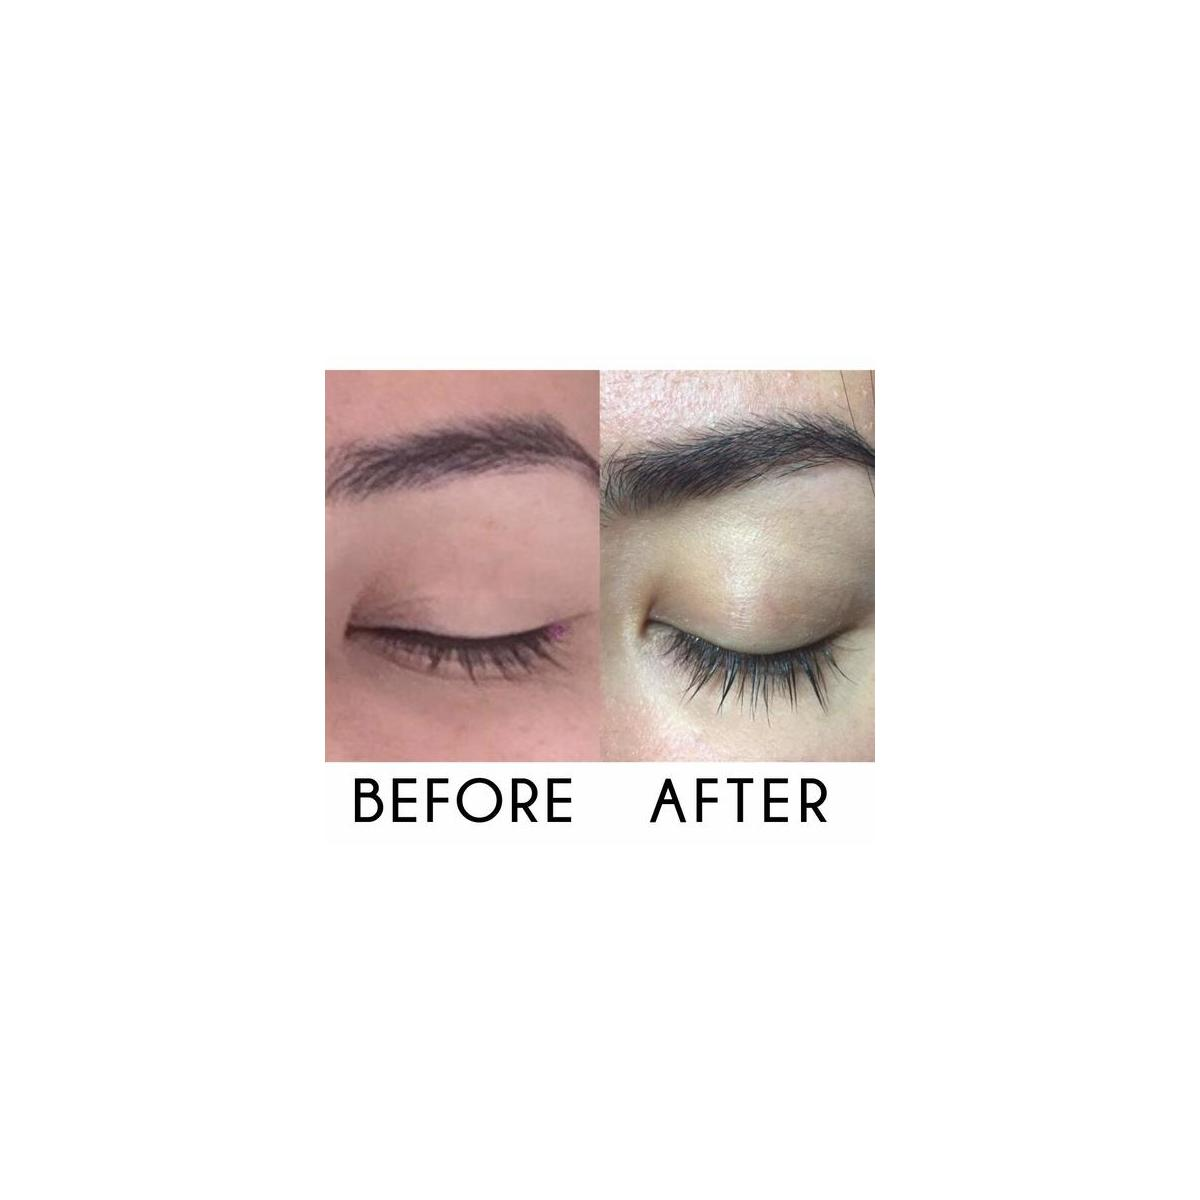 Eyelash Growth Serum Eyebrow Growth - Vegan Lash Boost 8,5 ML - Best Eyelash Conditioner - Brow Enhancer - USA Made Irritaion Free Formula